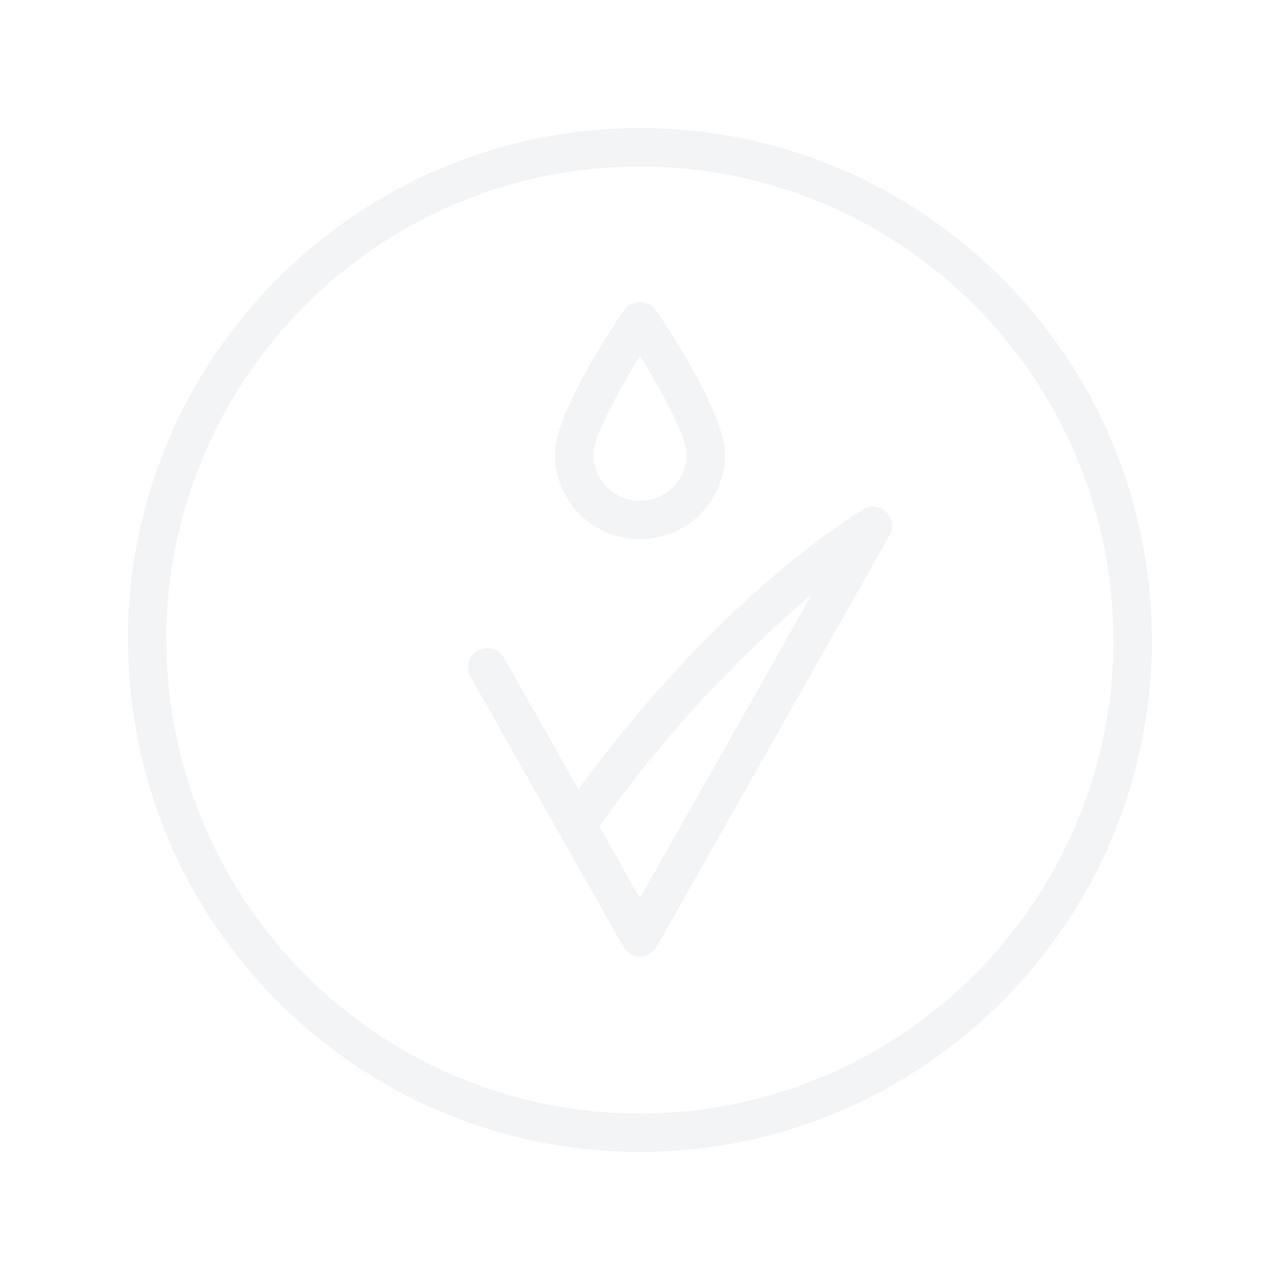 HOLIKA HOLIKA Good Cera Super Ceramide Lip Oil Balm 10g